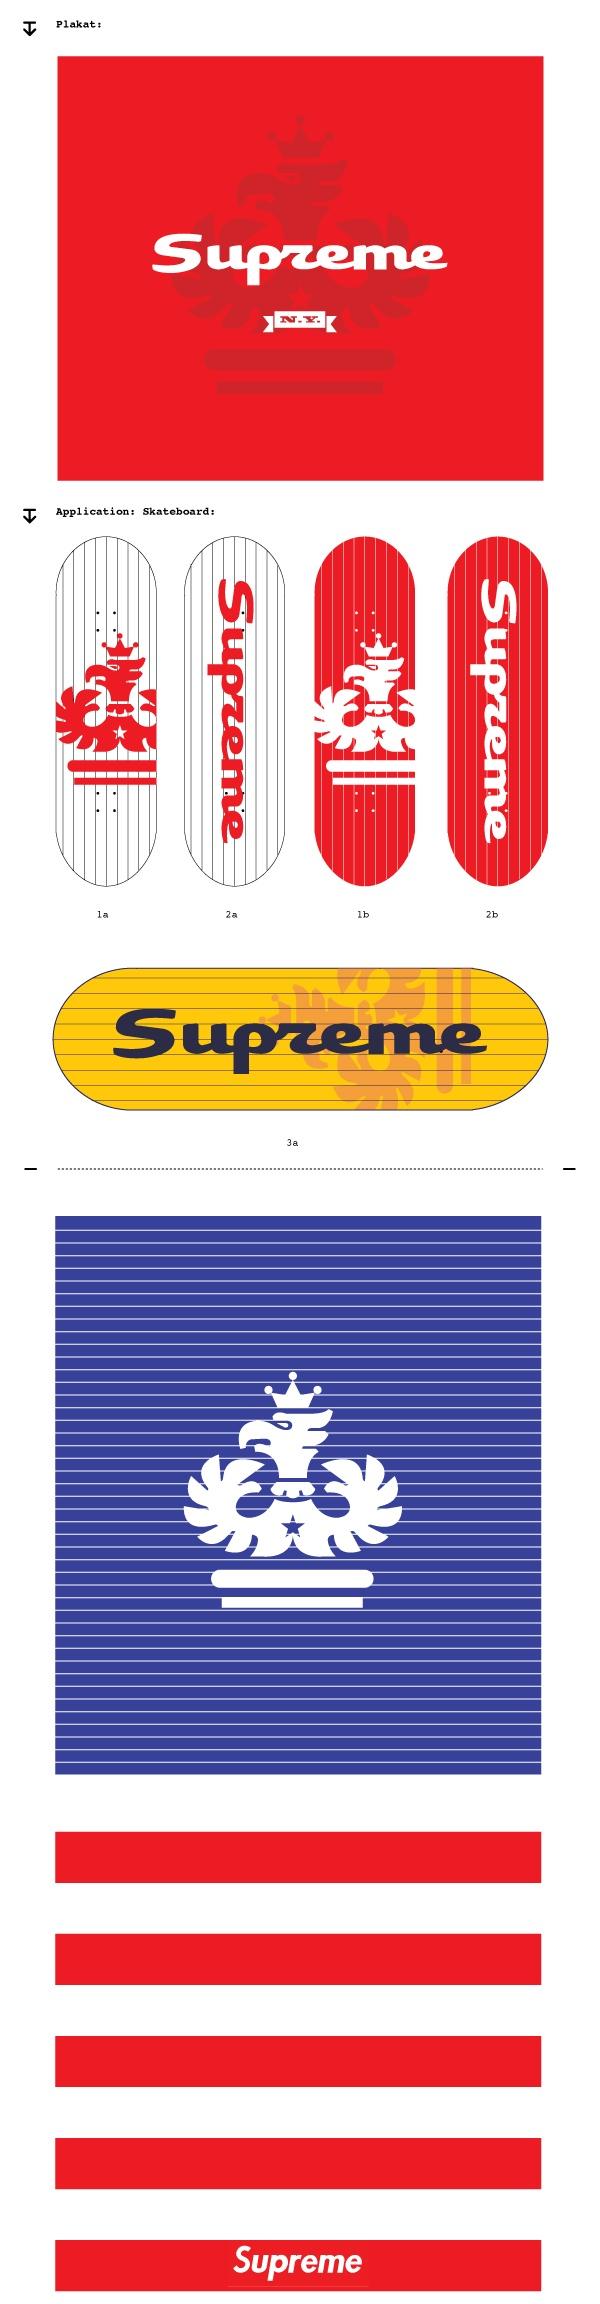 supreme skate id exploration Company logo, Tech company